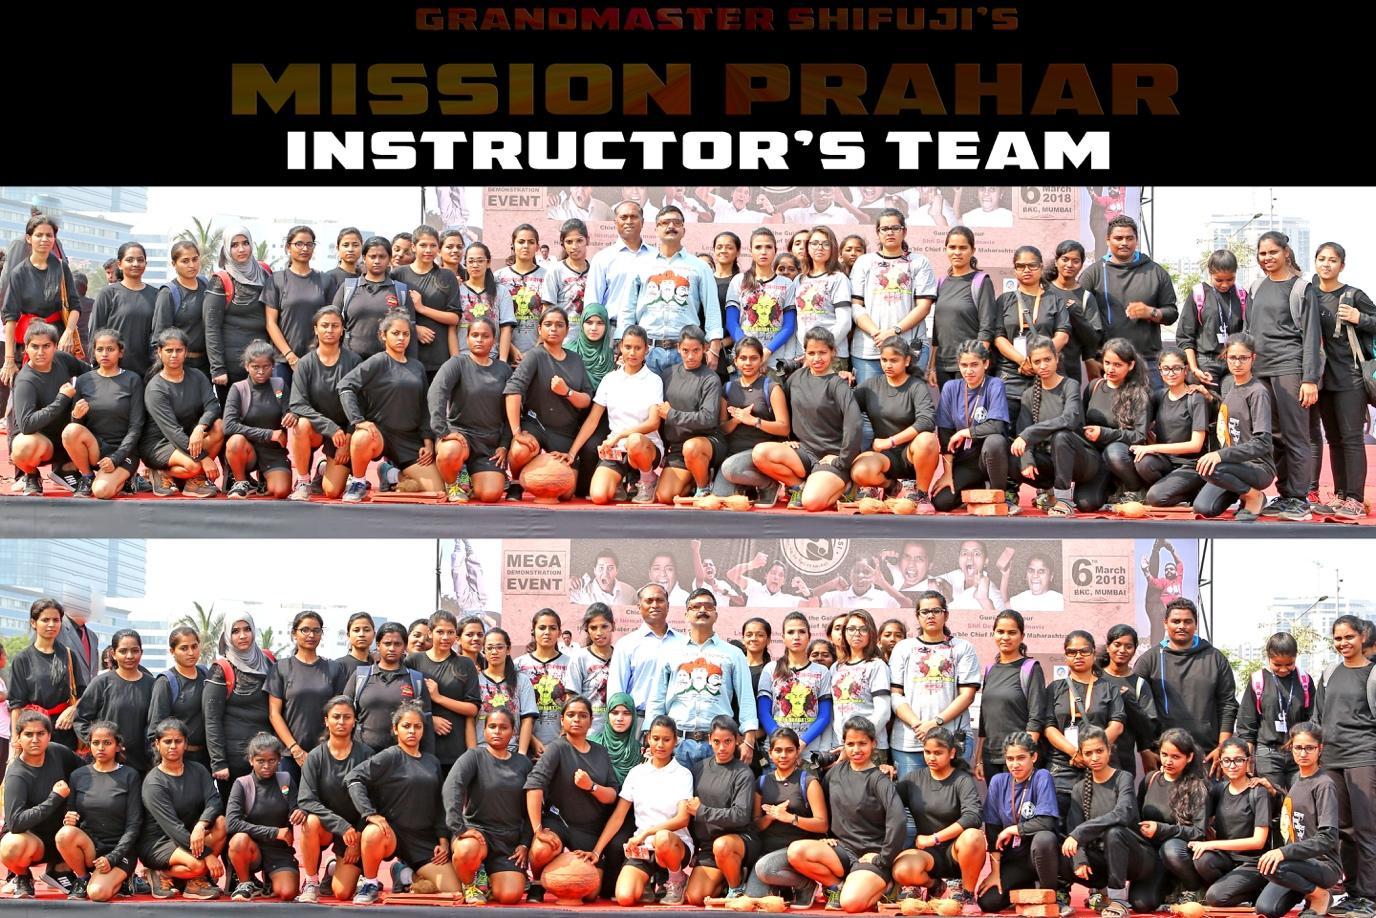 Mission%20Prahar%20Instructors%20team%20.jpg